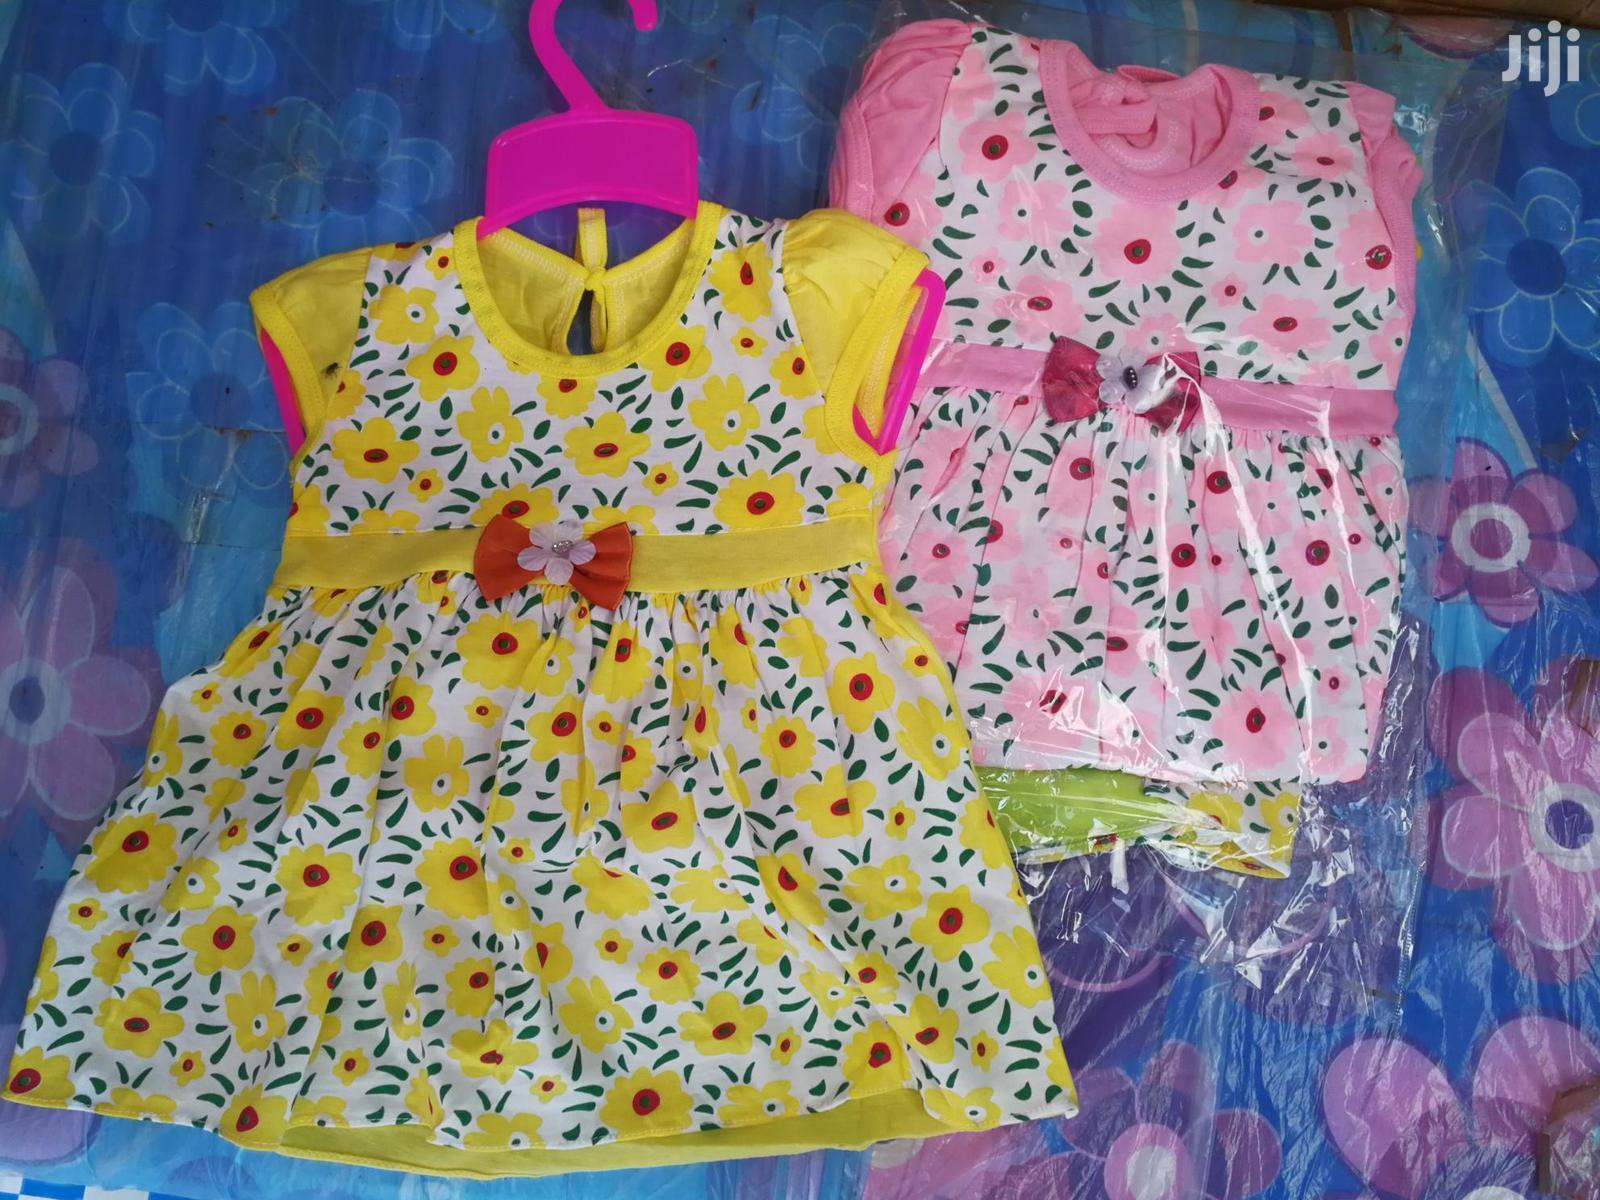 Brand New Cotton Newborn Dresses | Children's Clothing for sale in Kampala, Central Region, Uganda